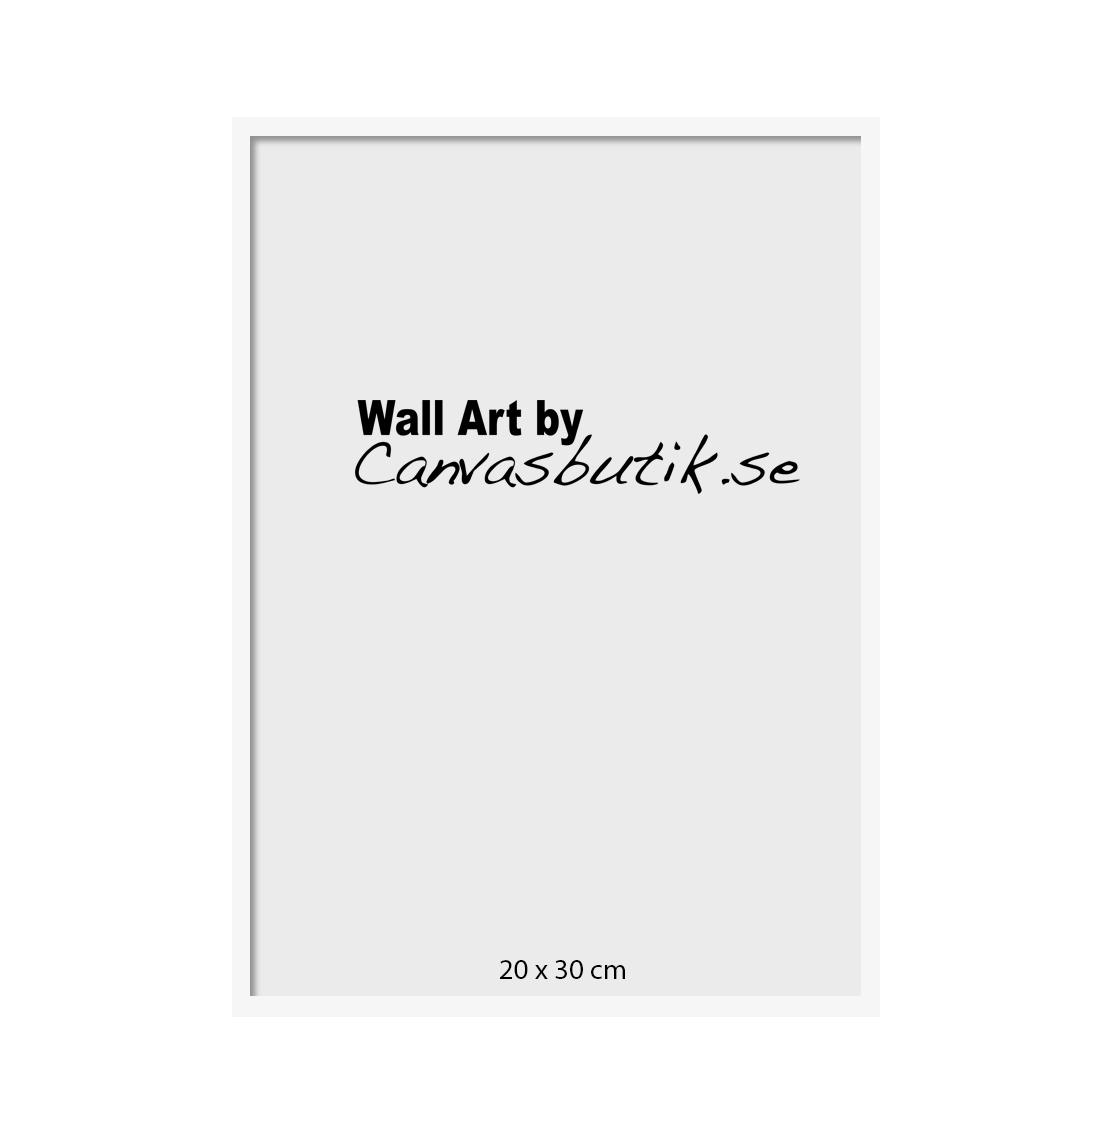 Picture frame - Canvasbutik.com